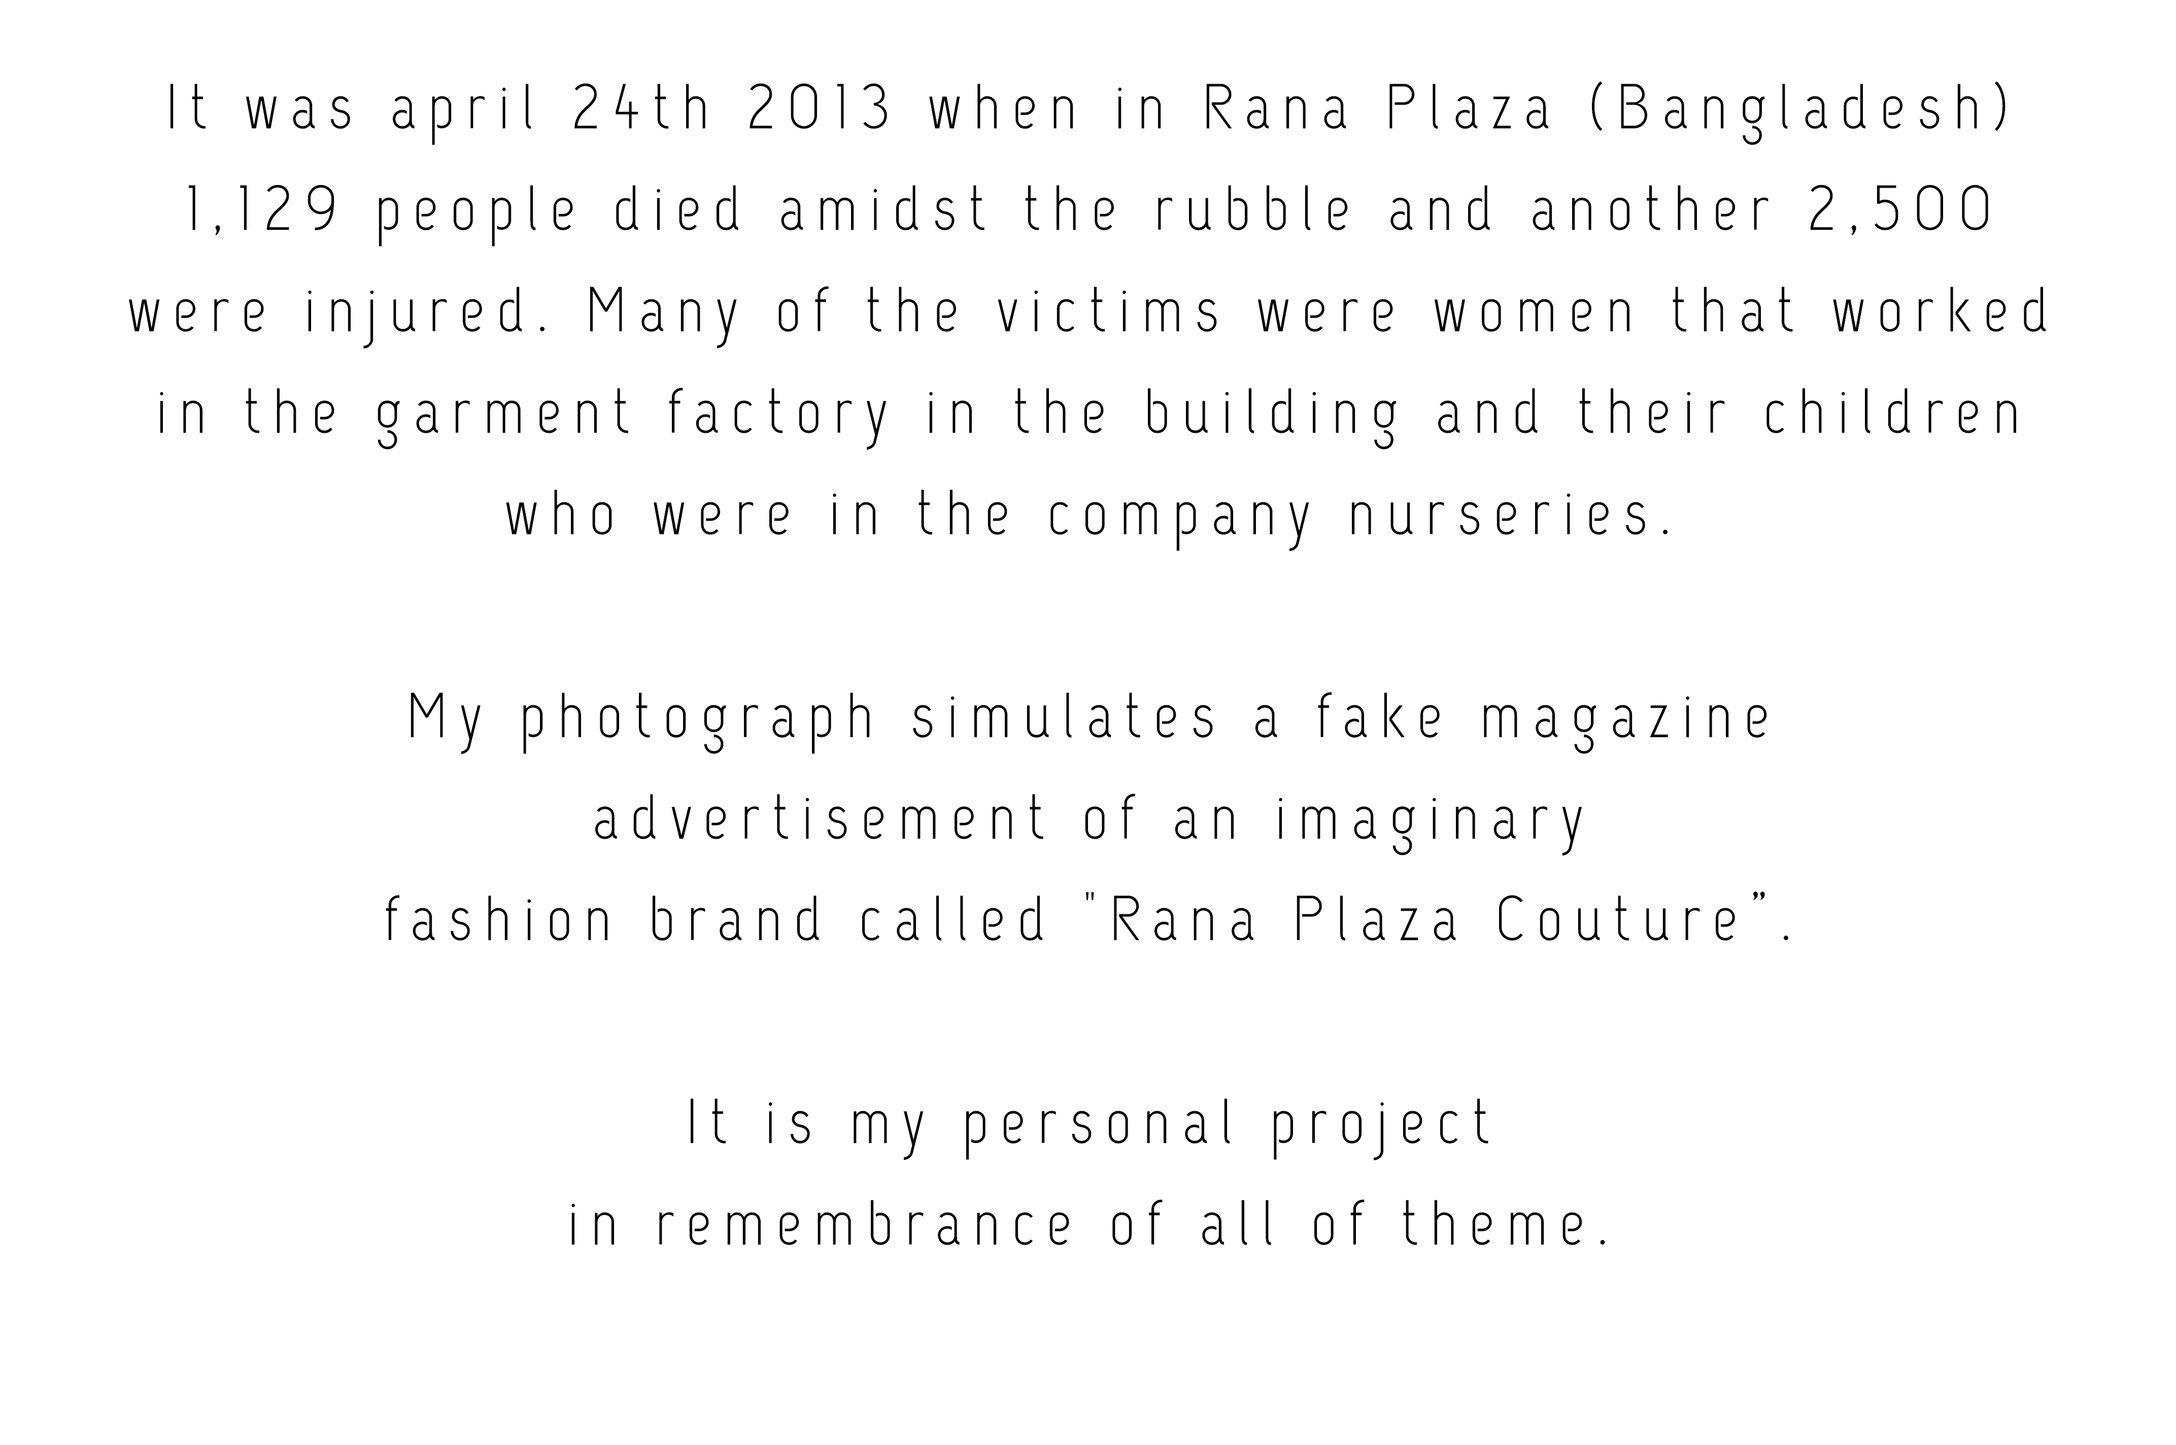 002_intro_Rana Plaza Couture.jpg